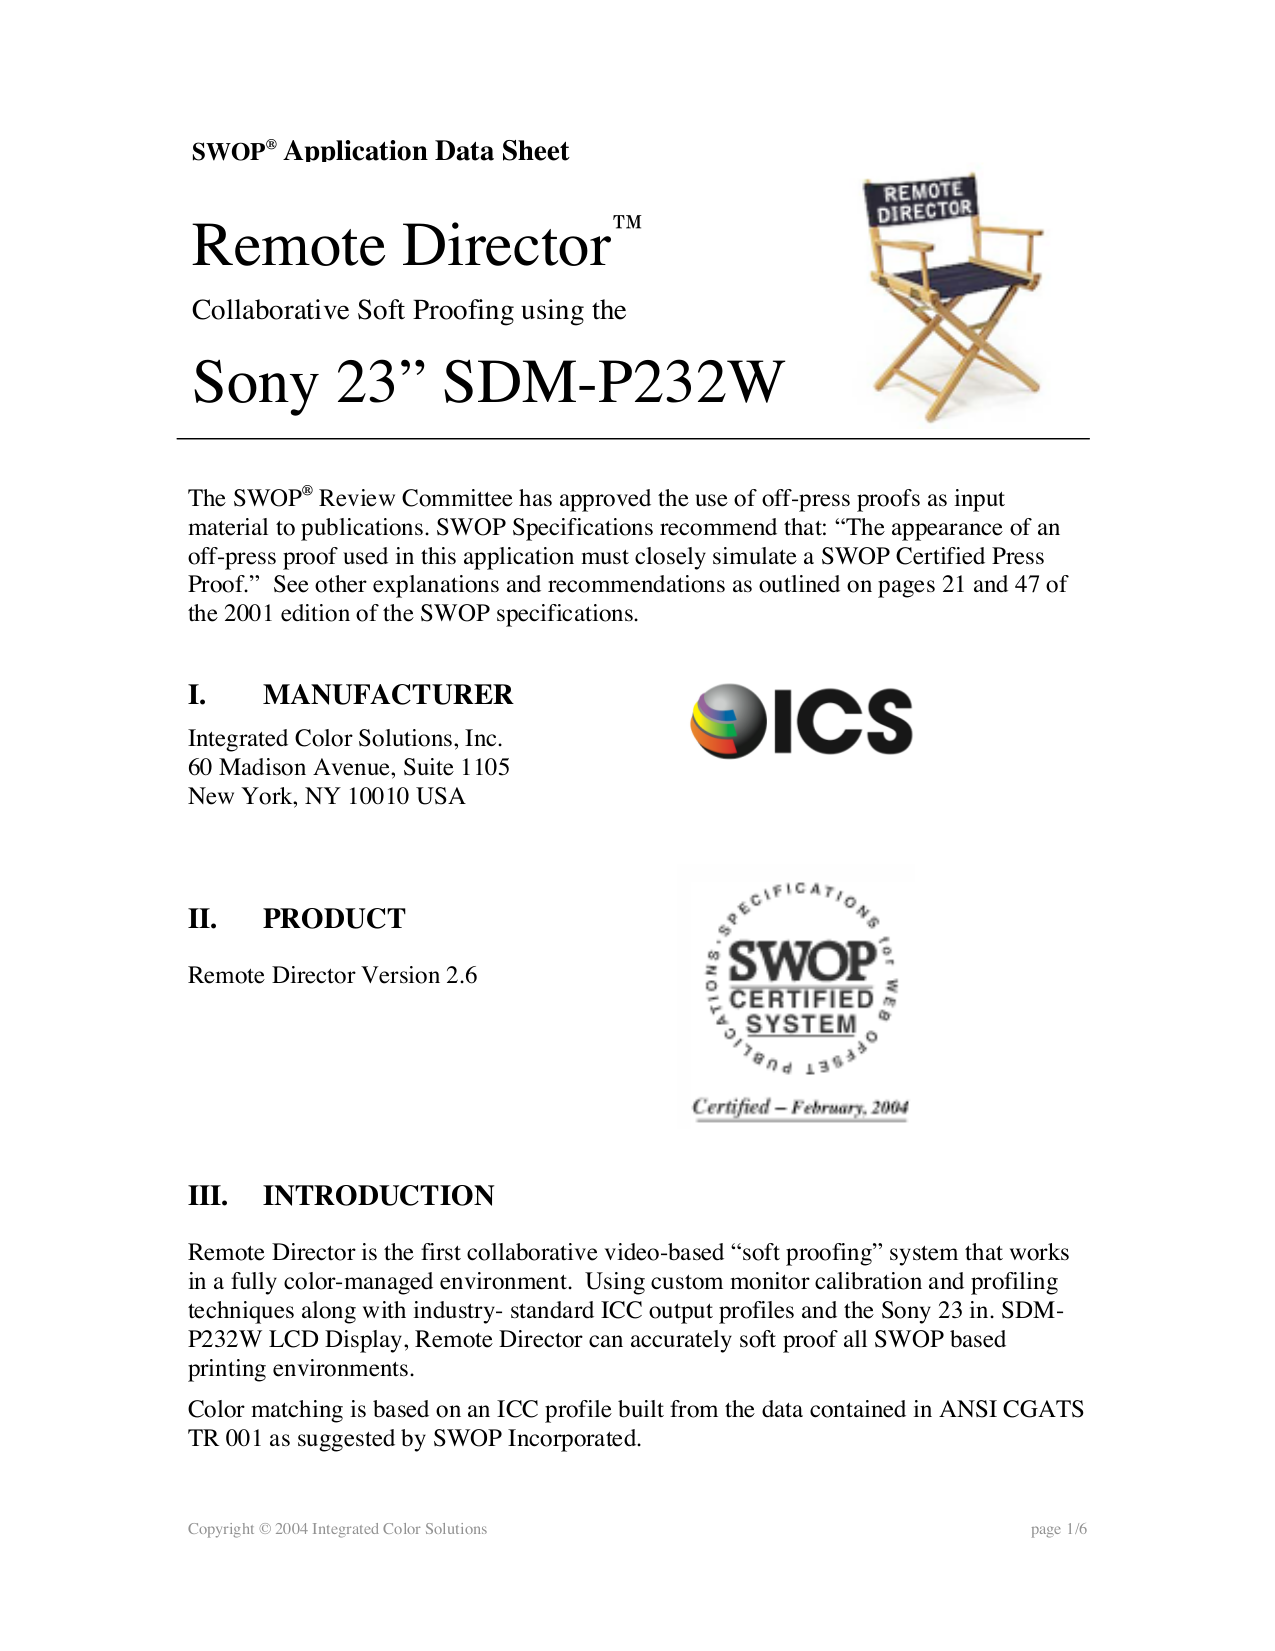 pdf for Sony Monitor SDM-P232W manual